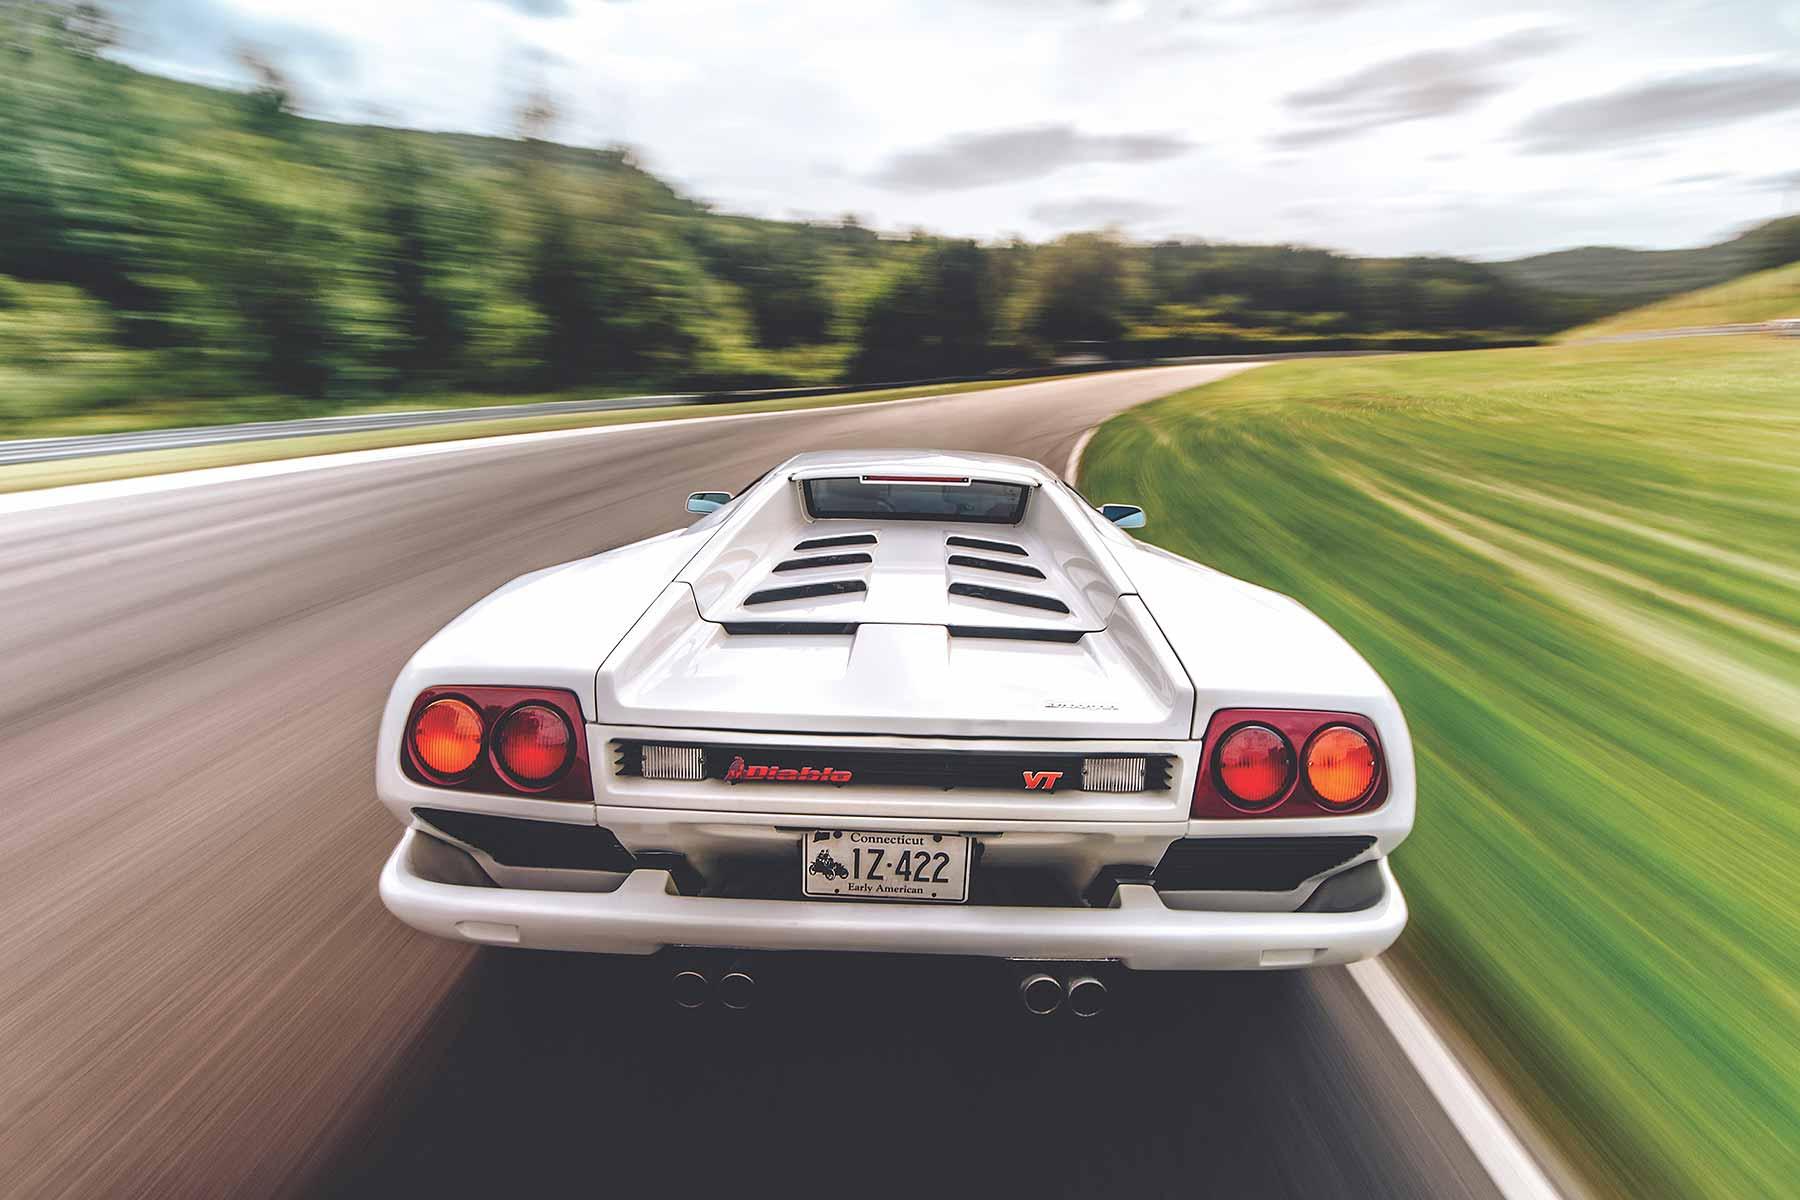 https://www.motoringresearch.com/wp-content/uploads/2017/12/1990%E2%80%932001-Lamborghini-Diablo.jpg